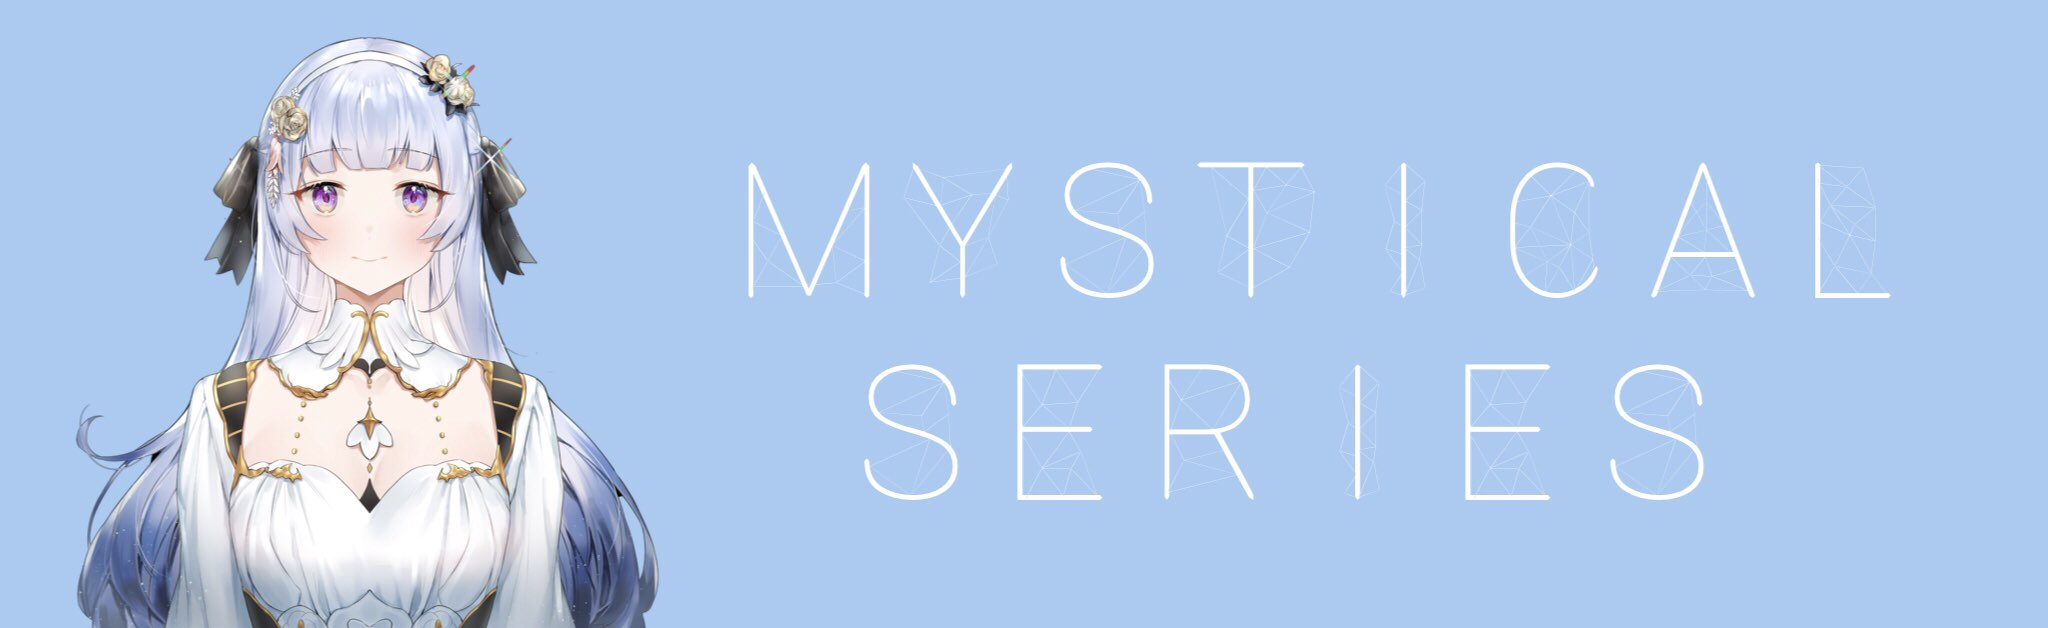 Mystical Series